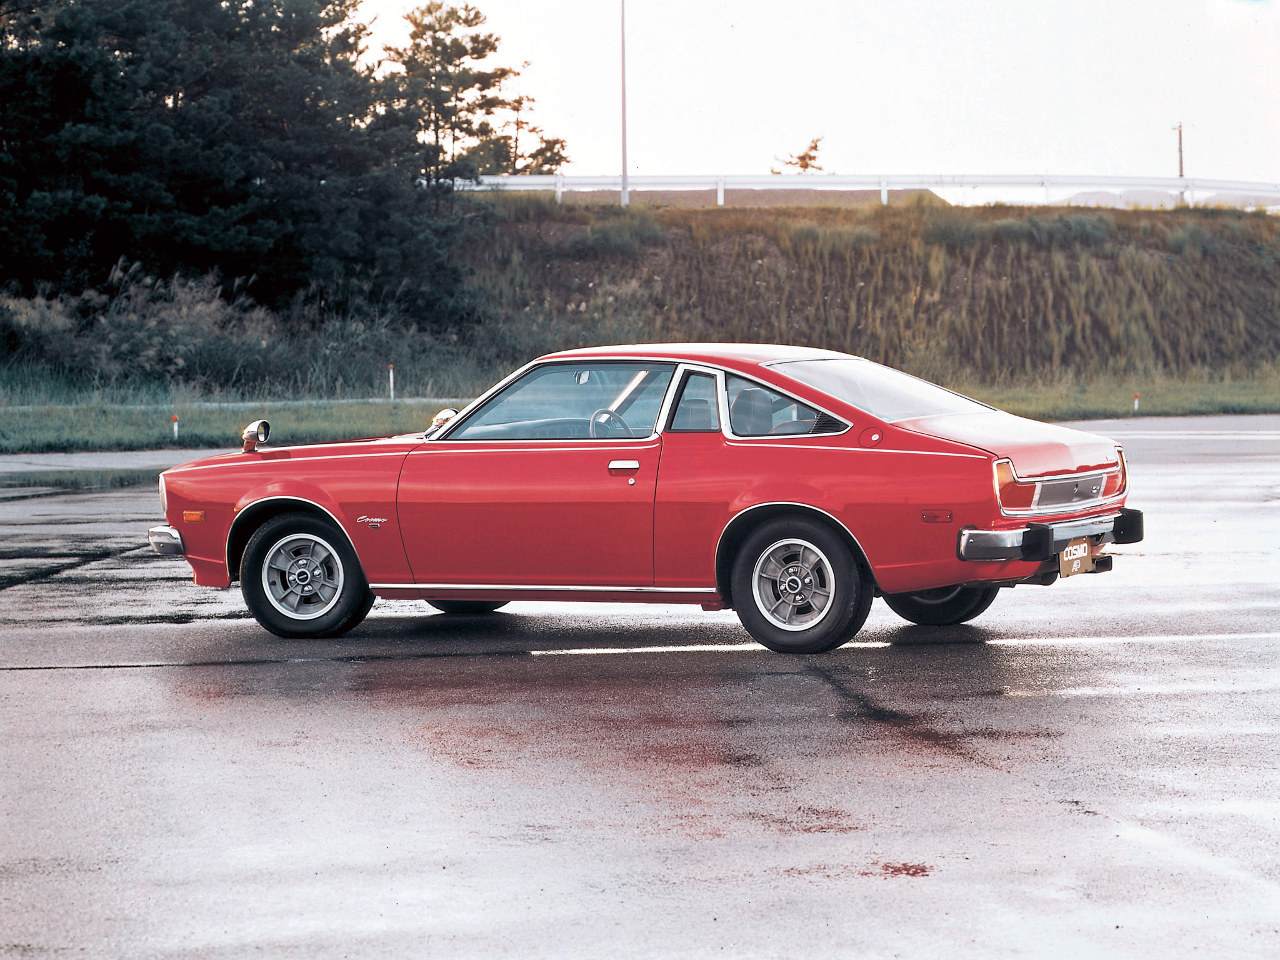 [Image: Mazda%2BCosmo%2BAP%2B75%2B%2528jp%2529.jpg]